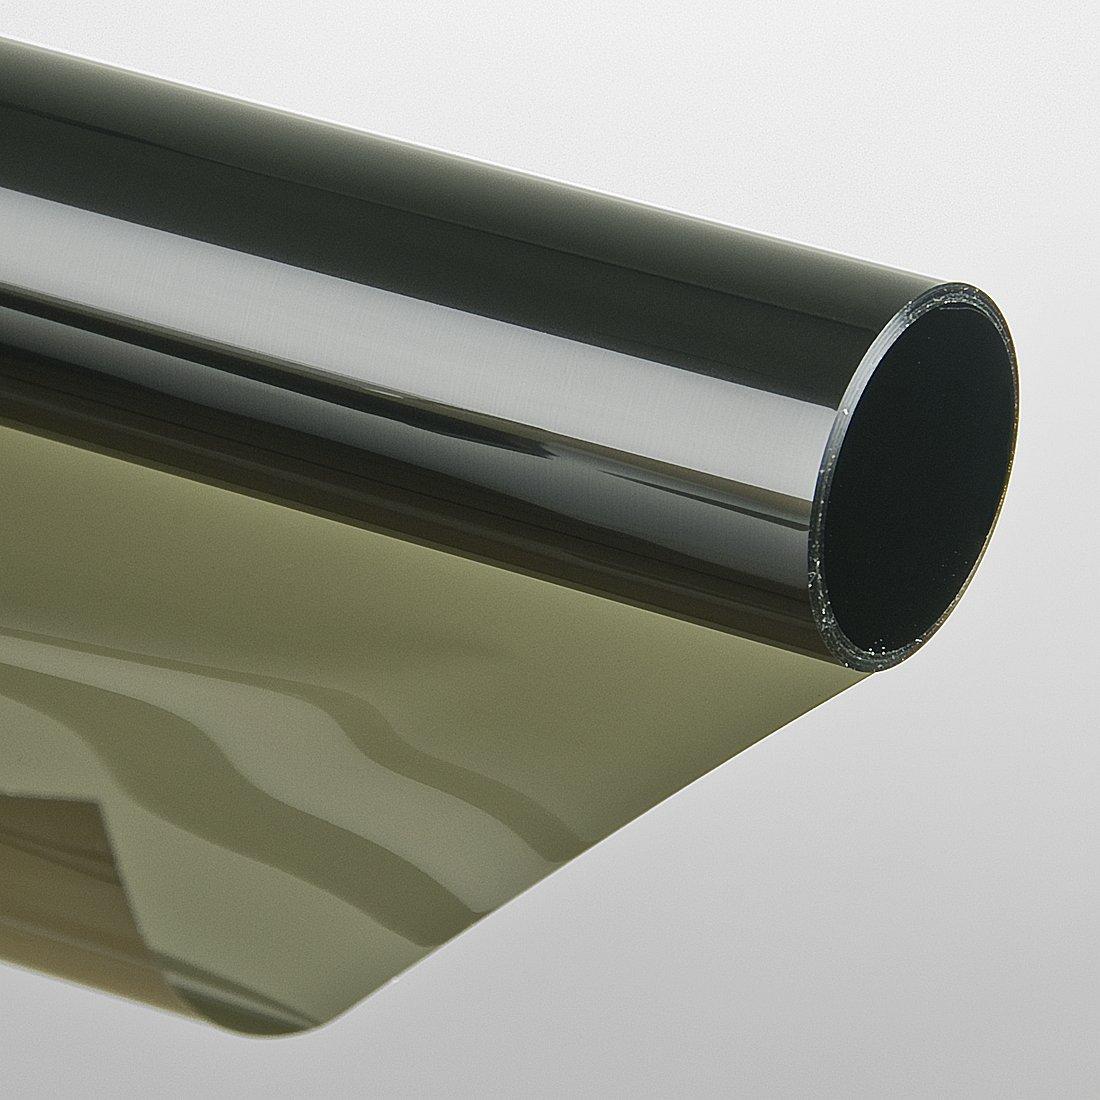 LED-Gigant - Adhesivo para ventanas (protector solar, resistente a los rasguñ os, tintado, 75 x 300 cm), color negro resistente a los rasguños 3007581201